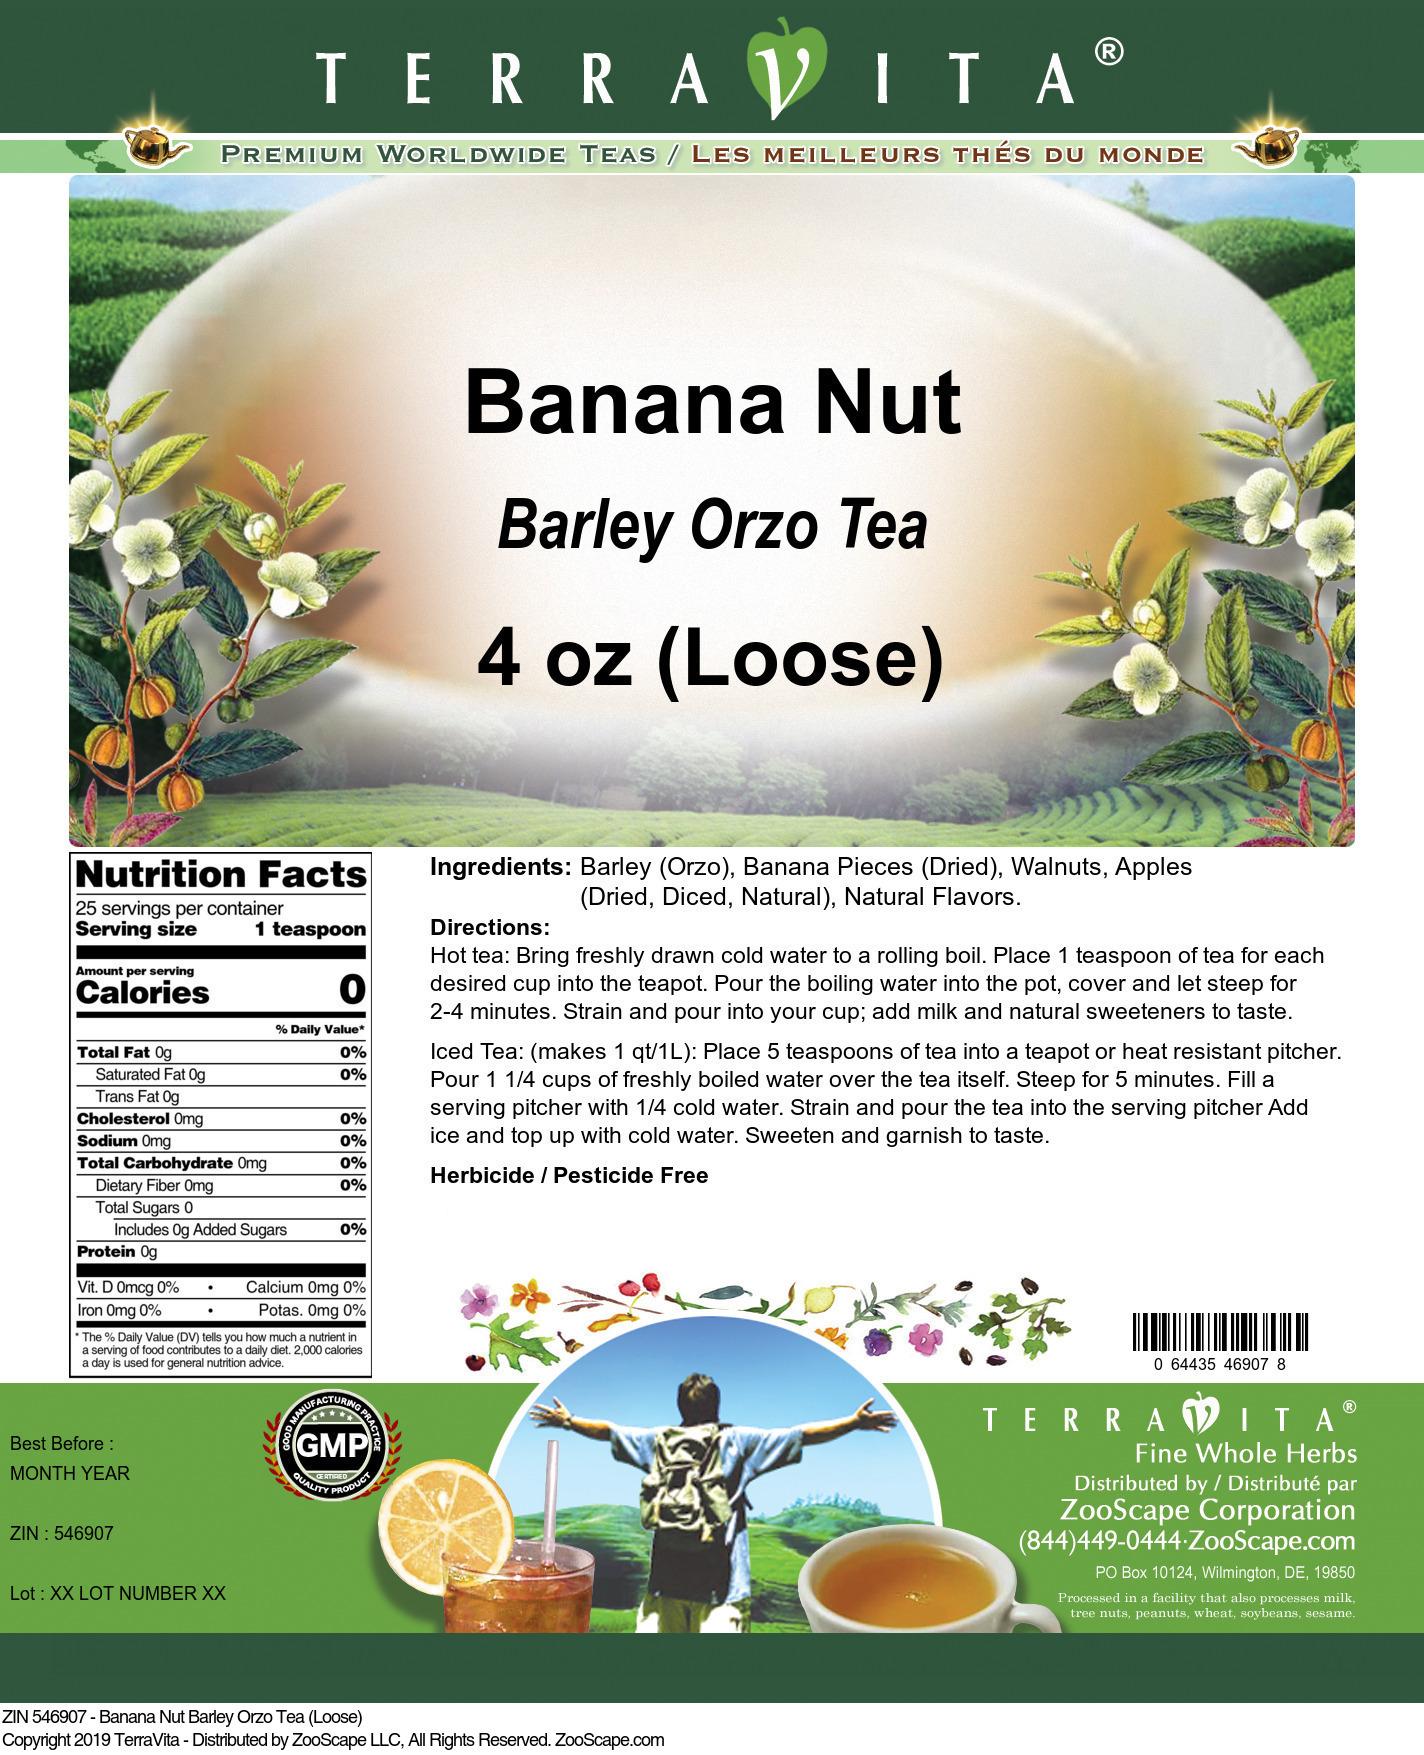 Banana Nut Barley Orzo Tea (Loose)